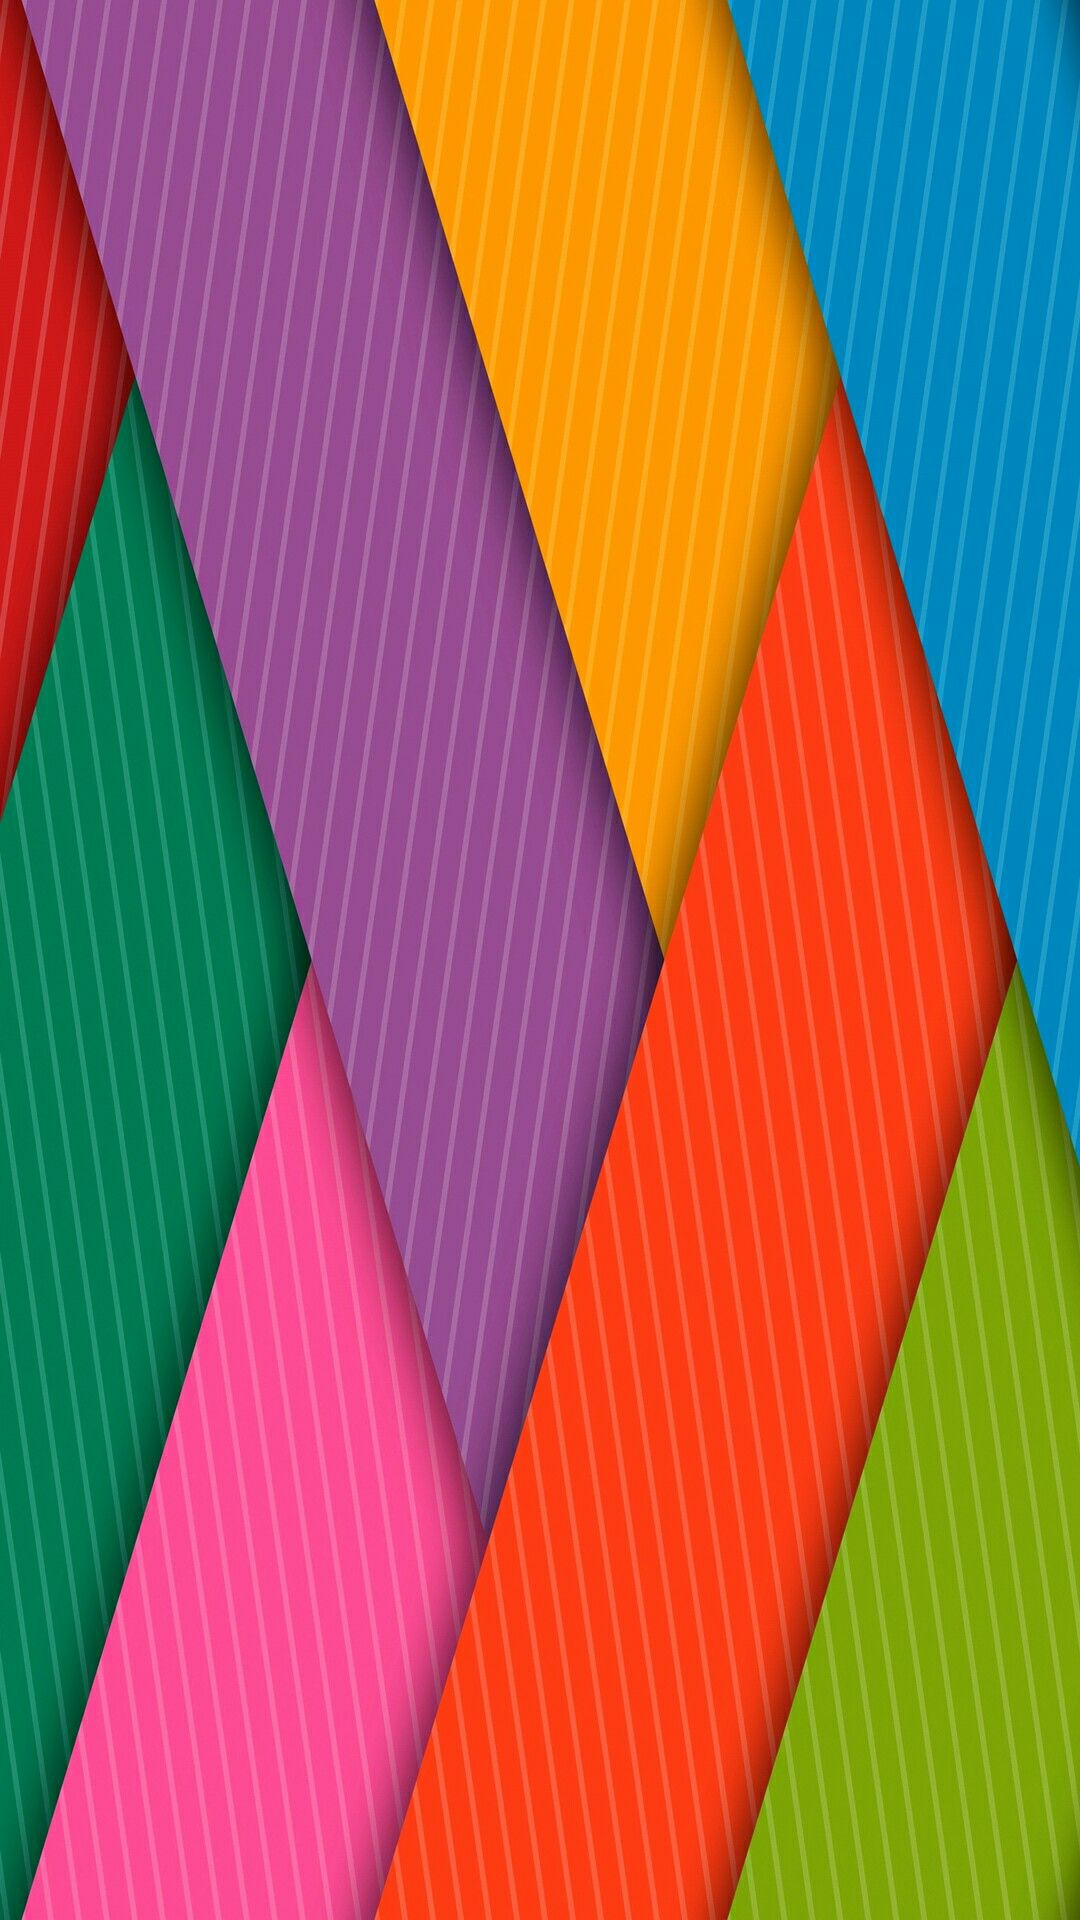 colors.quenalbertini: Rainbow Color iPhone Wallpaper   wallpapers in 2019   Qhd wallpaper ...